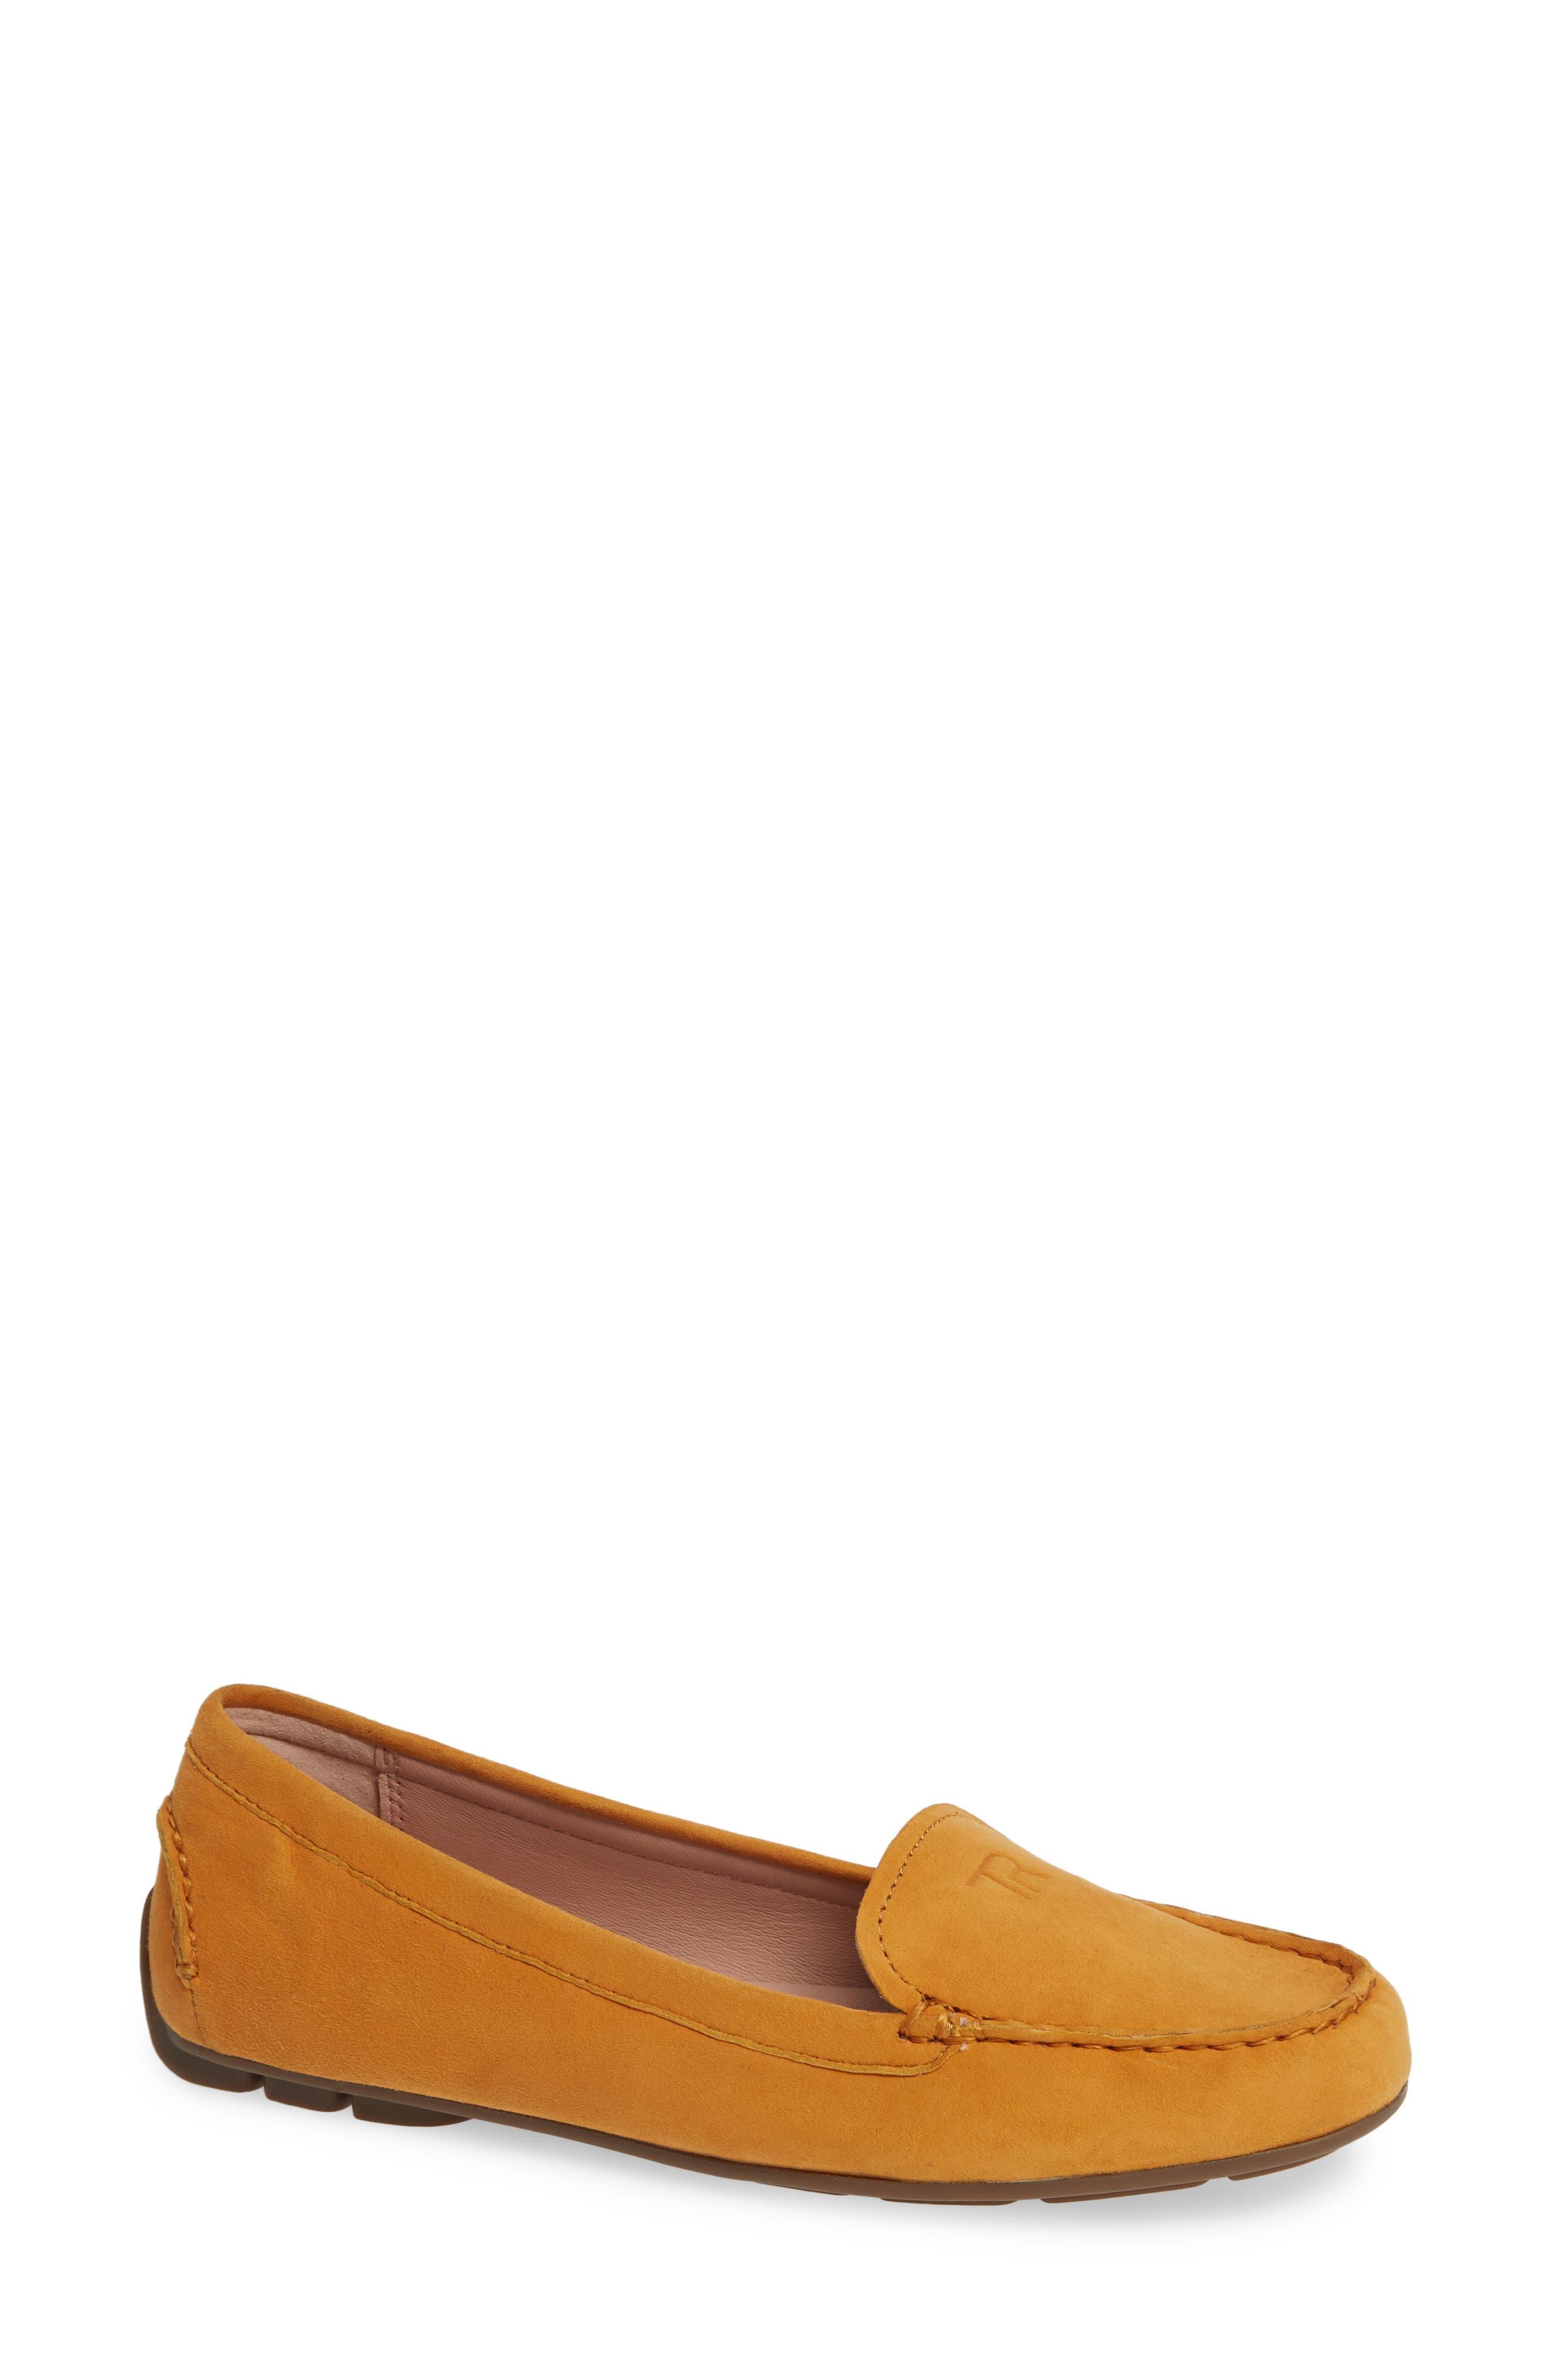 Taryn Rose Karen Water Resistant Driving Loafer, Yellow